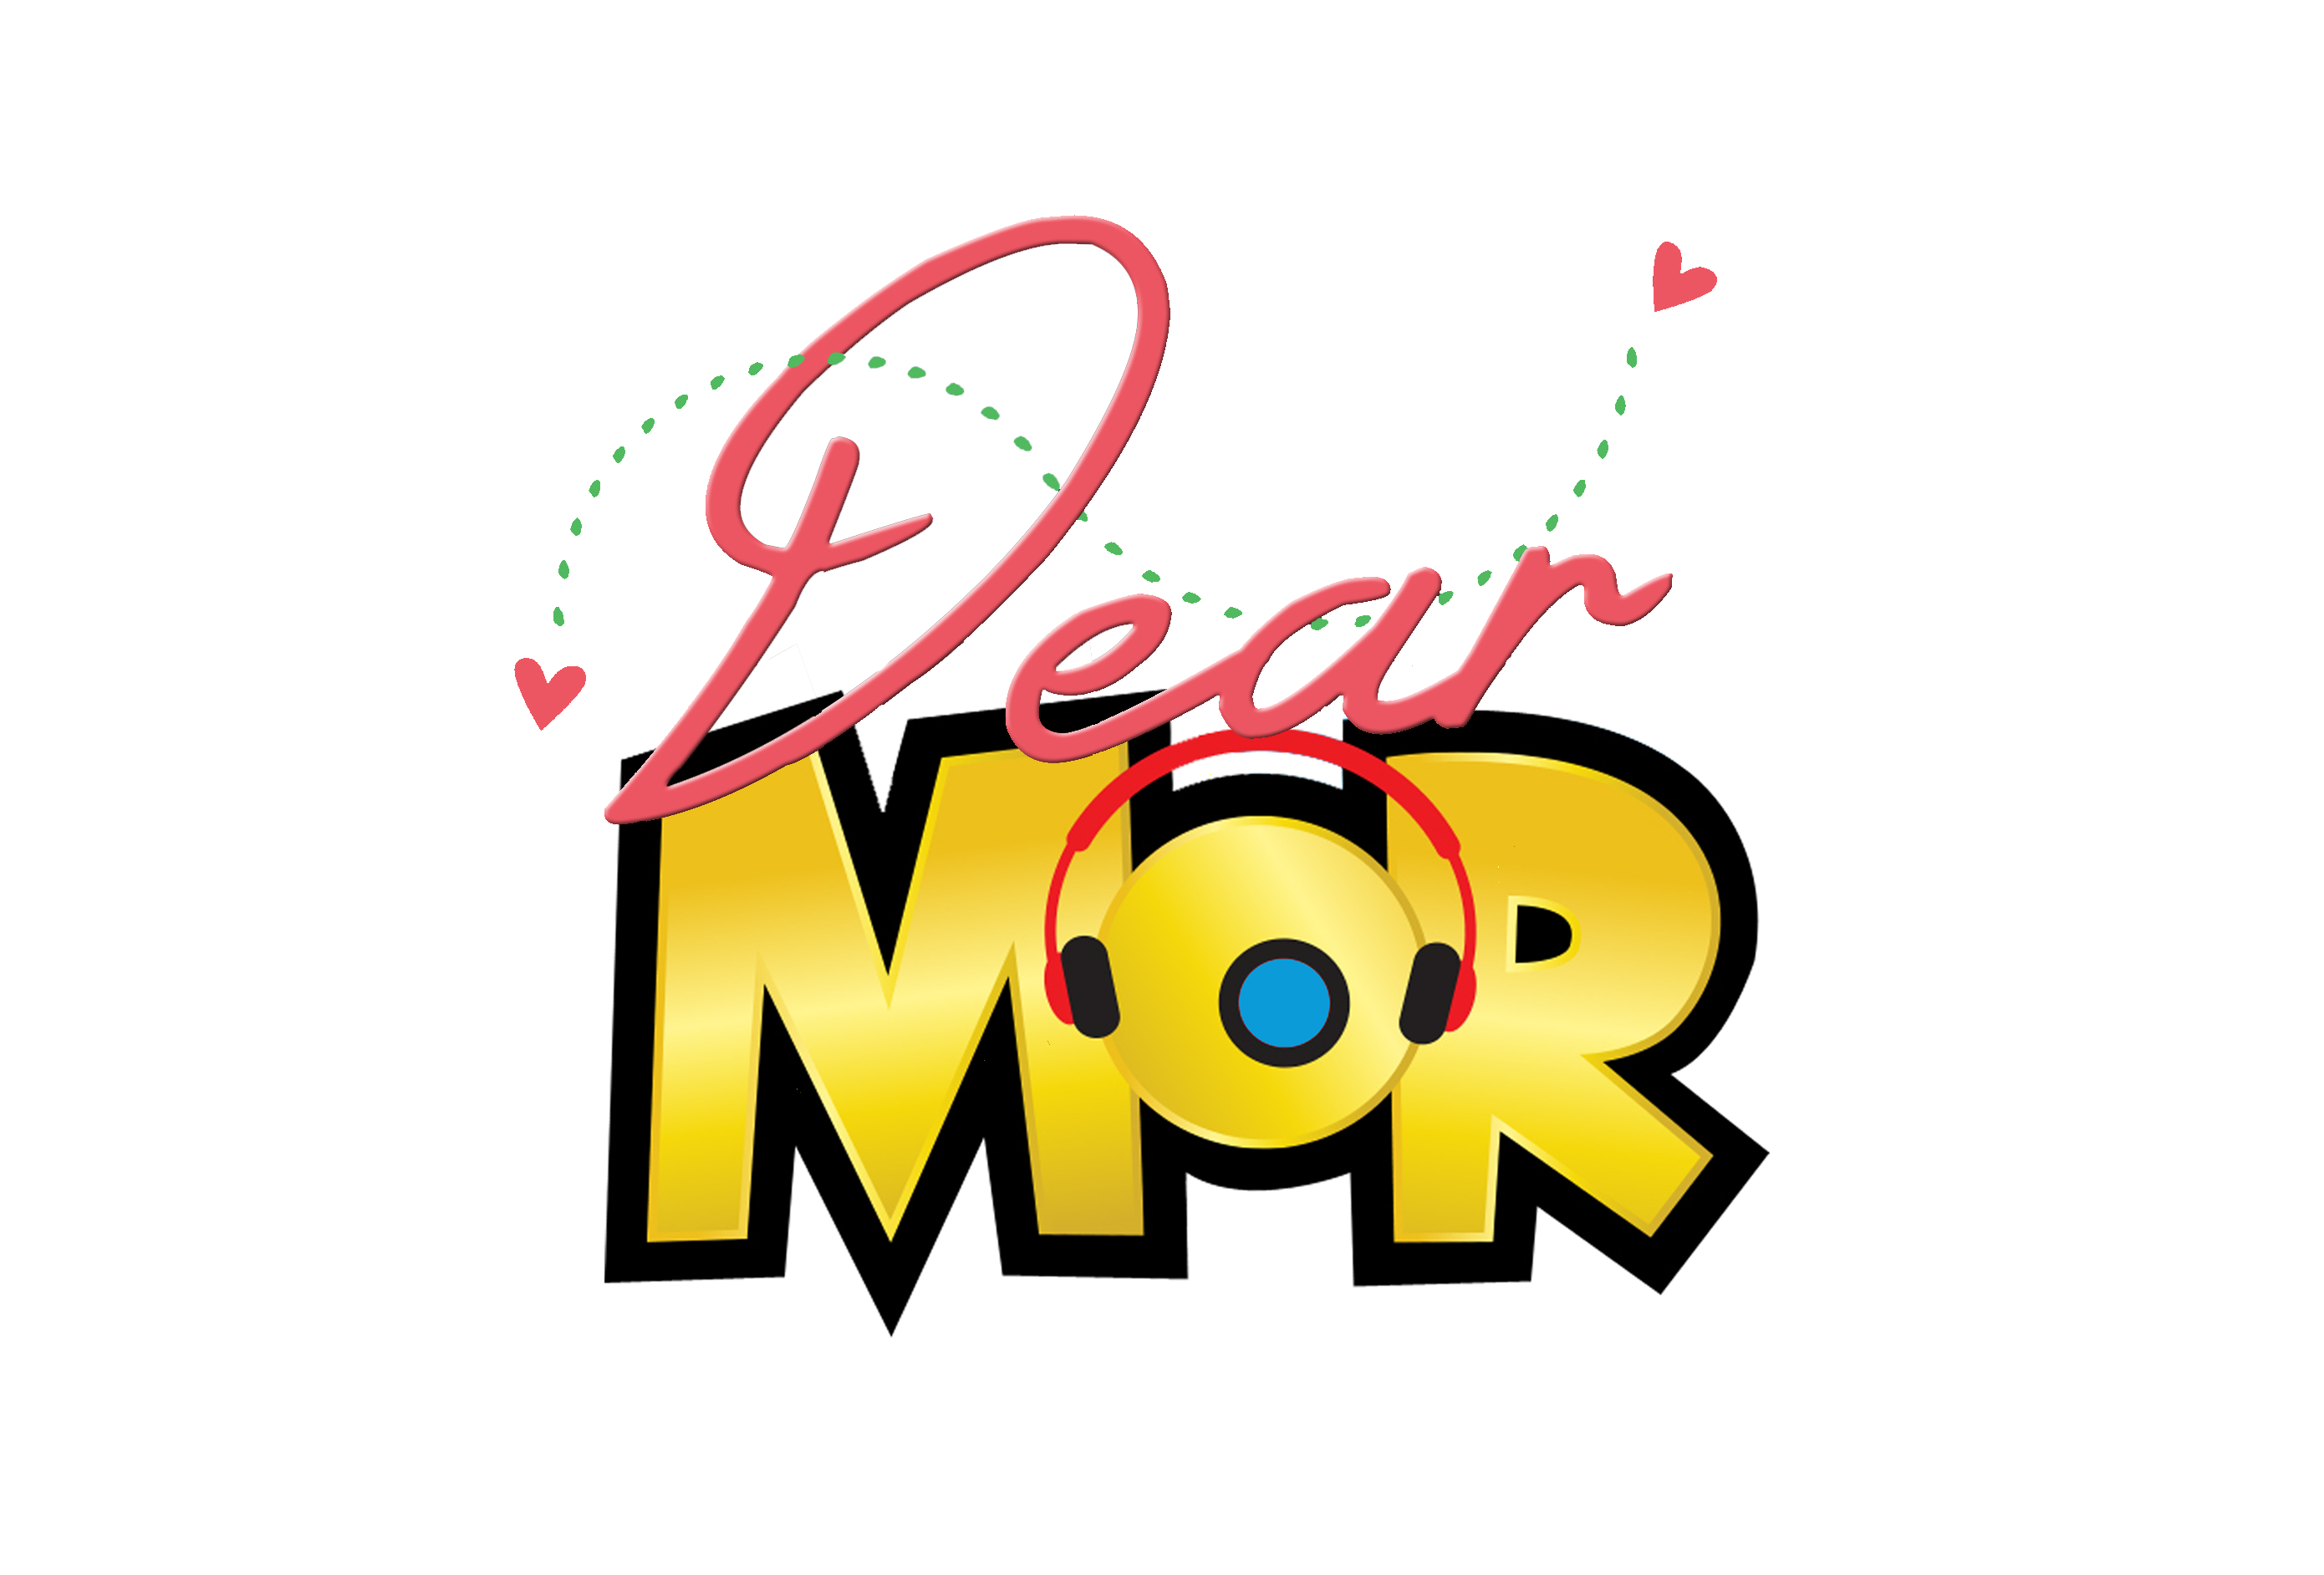 DEAR MOR (MANILA)